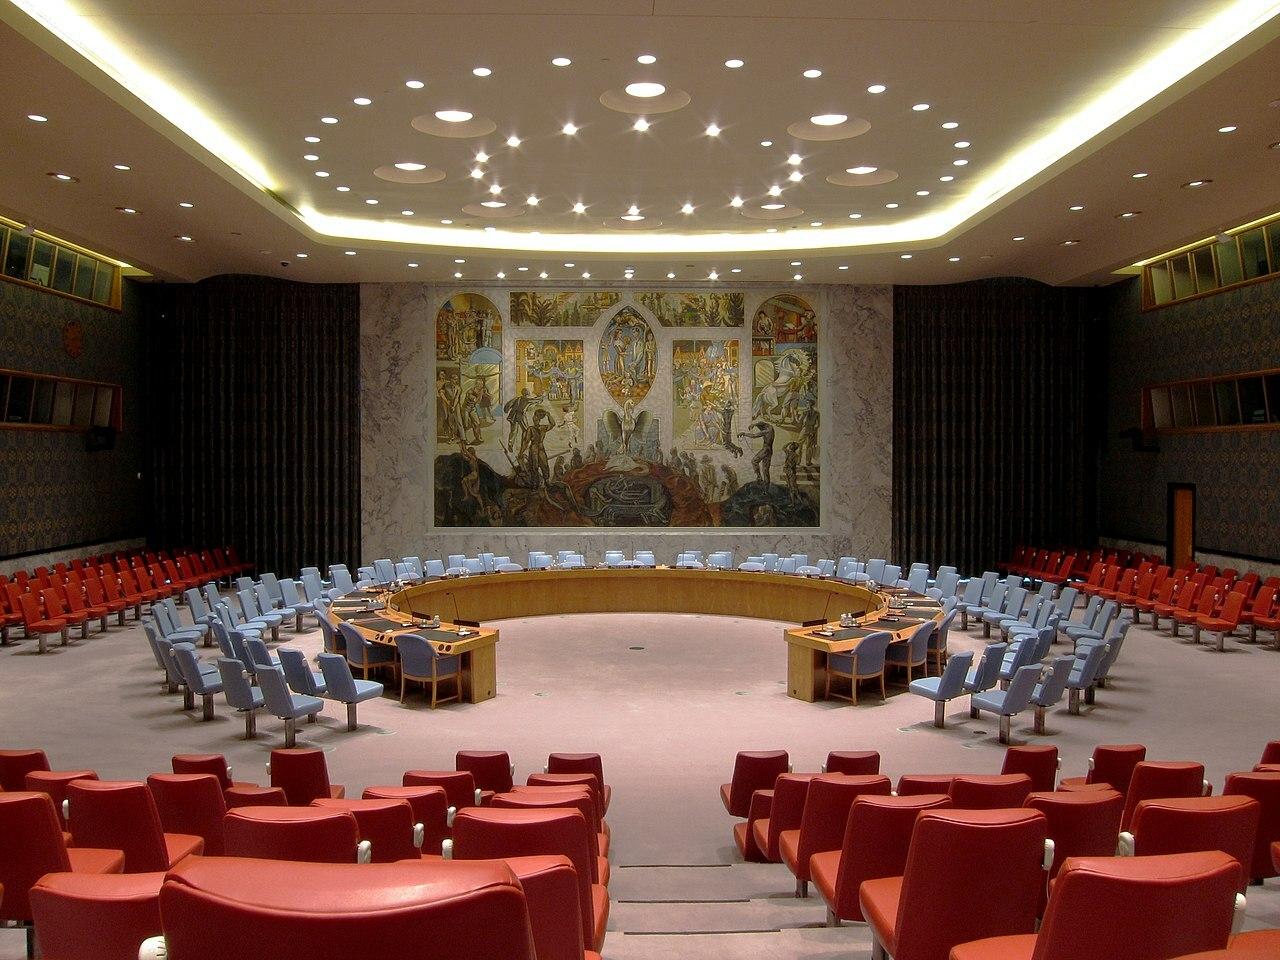 The EU as a permanent member of the UN Security Council